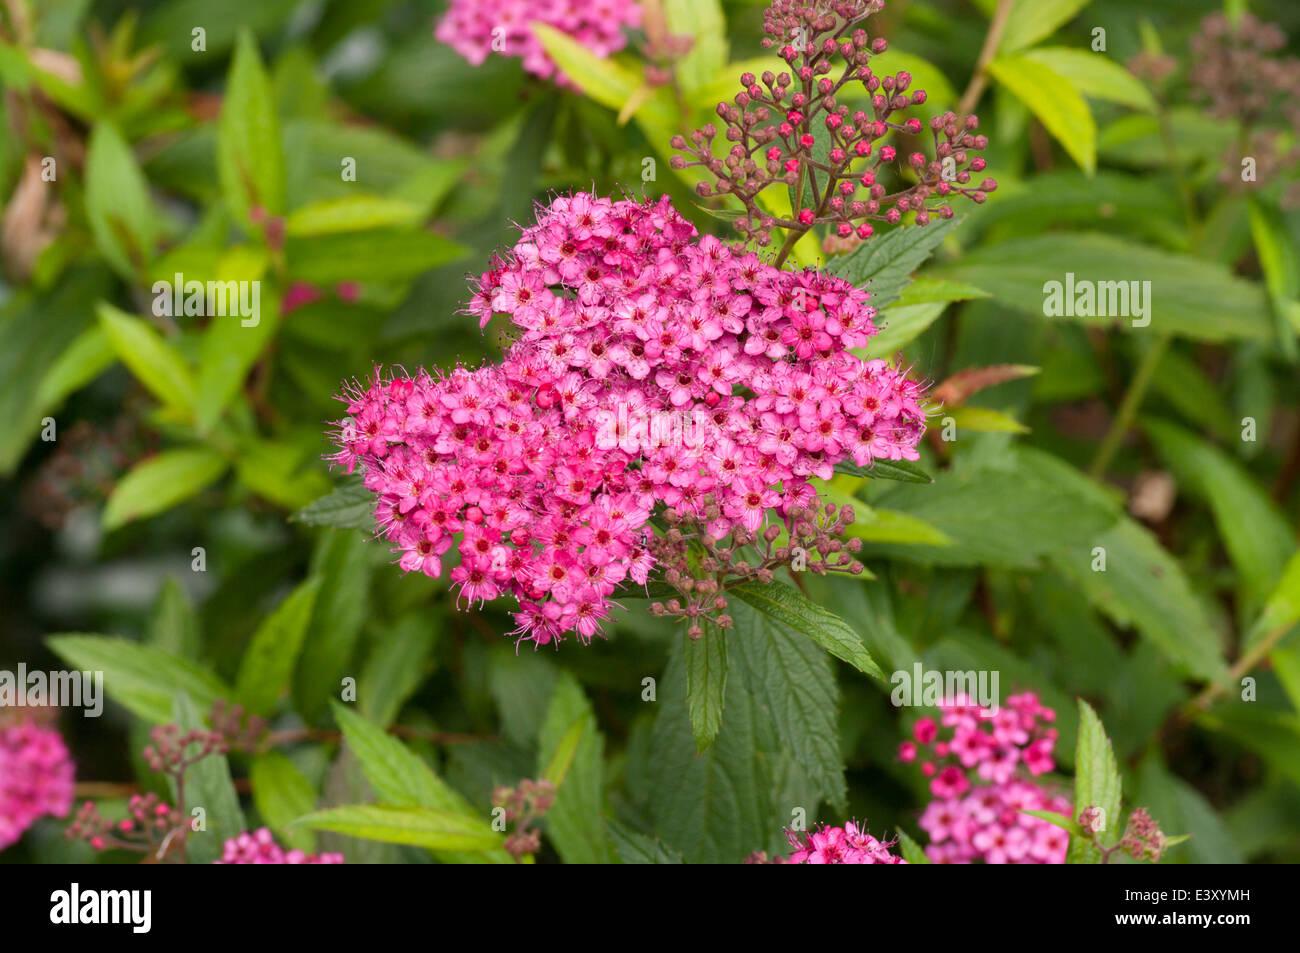 Pink spirea flowers stock photo 71277937 alamy pink spirea flowers mightylinksfo